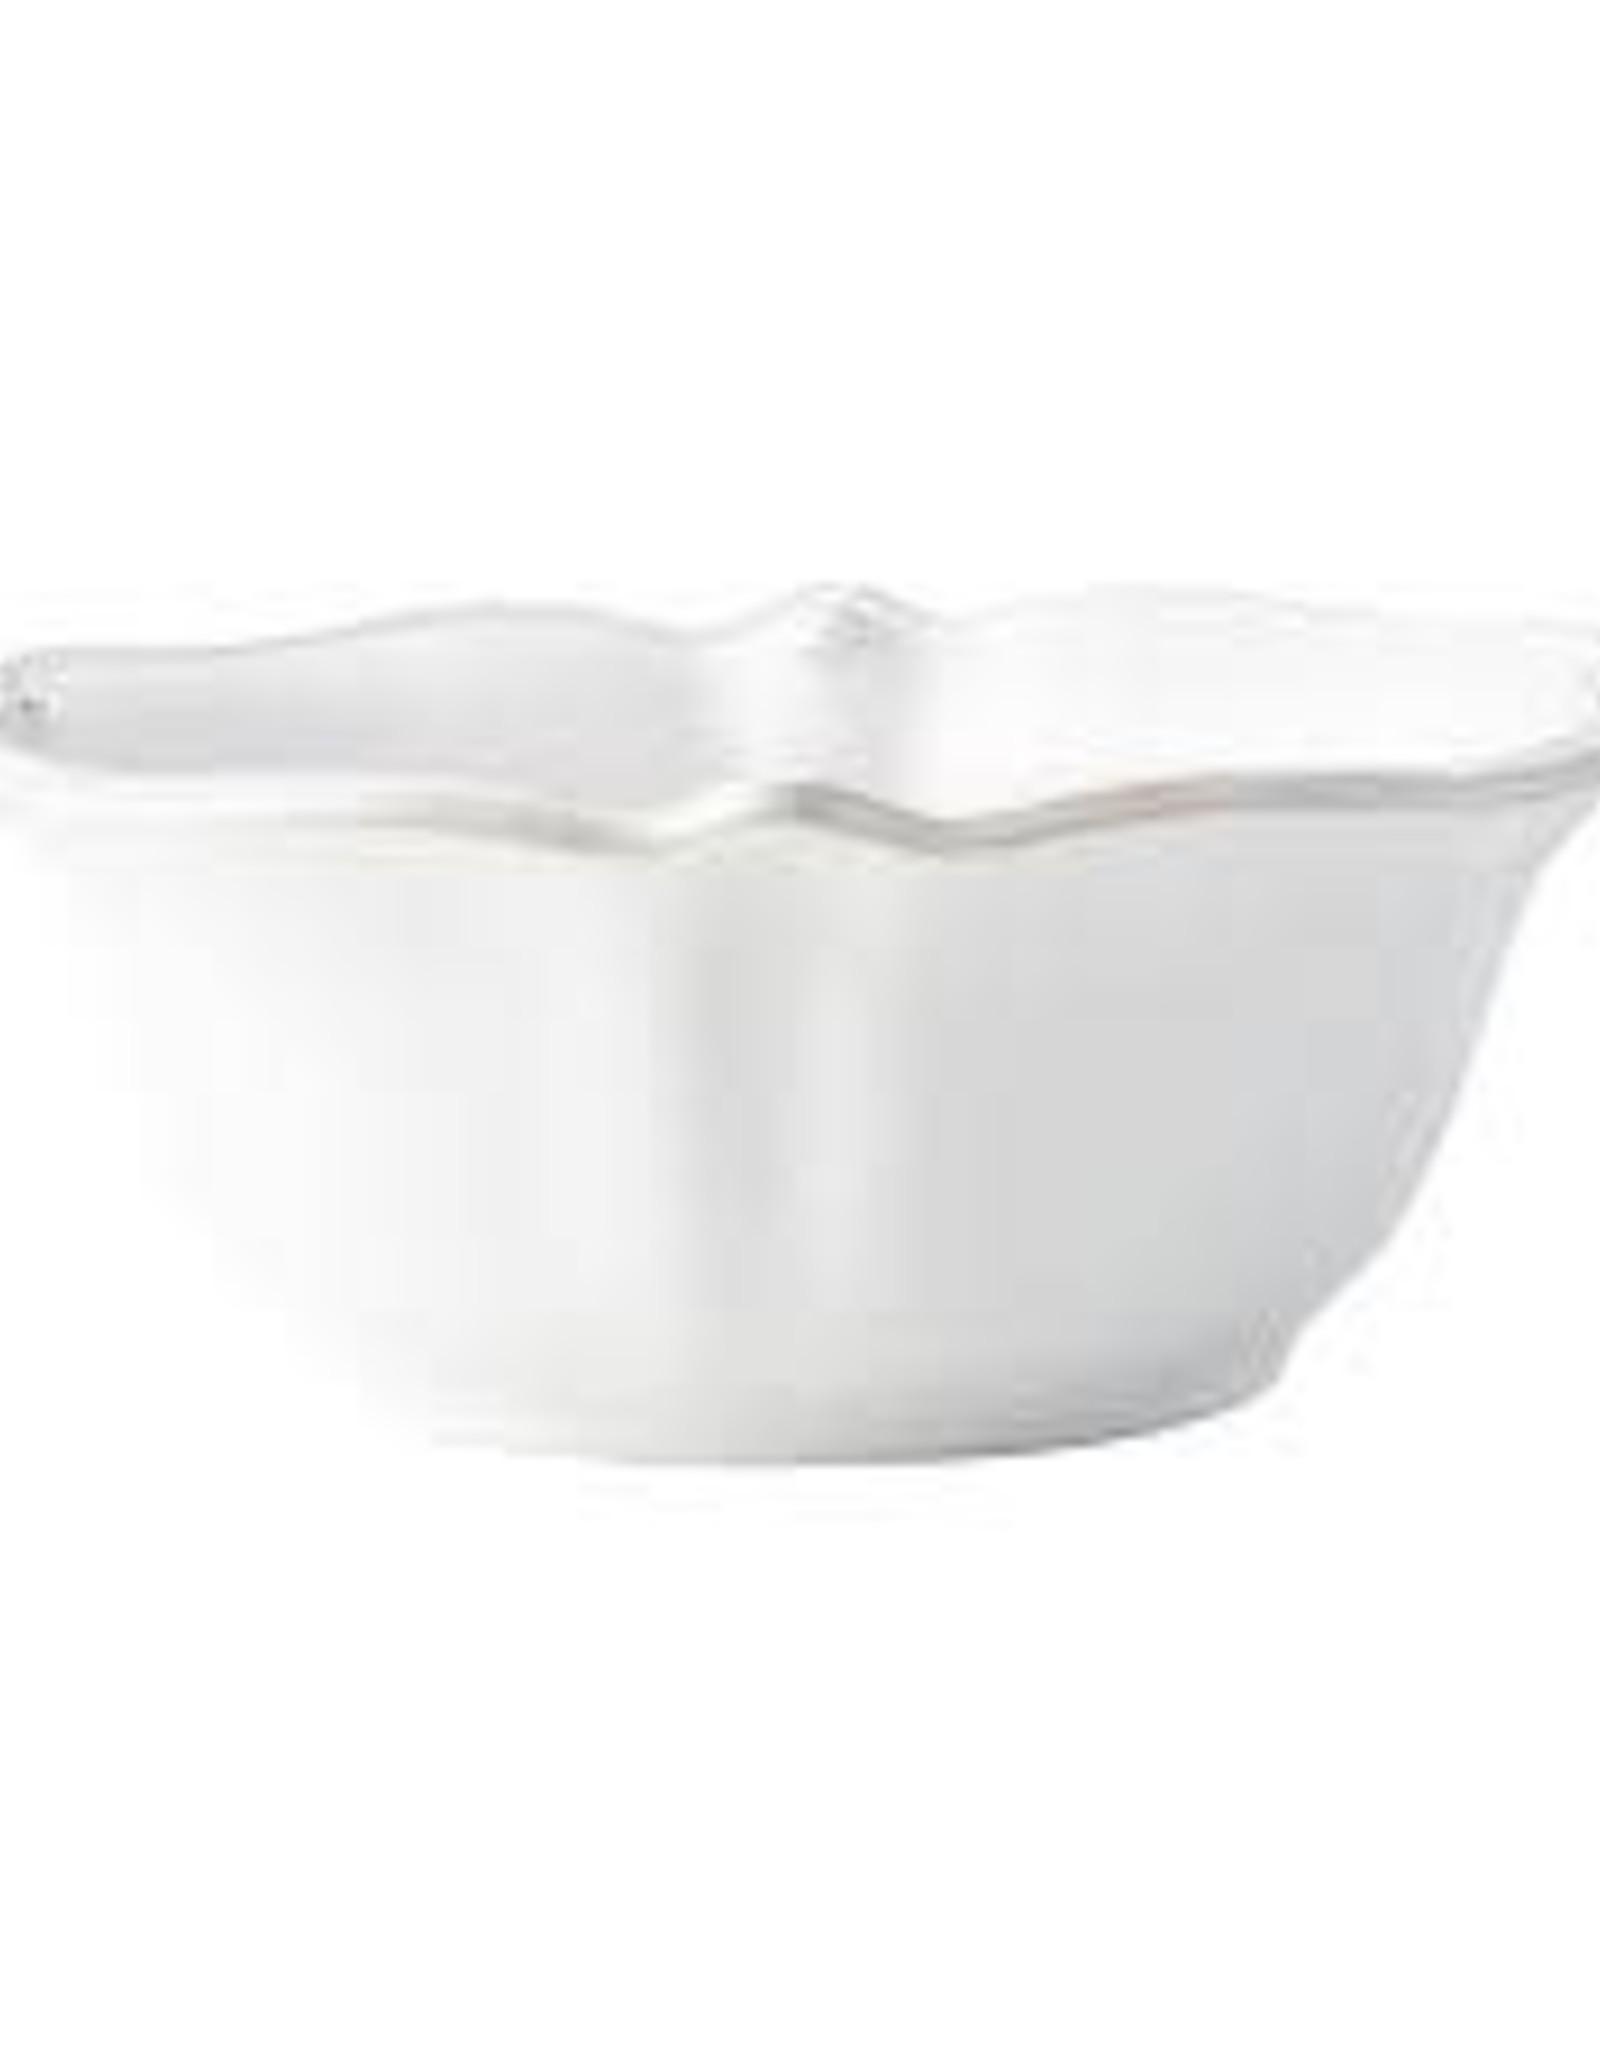 Juliska Berry & Thread Whitewash Cereal/Ice Cream Bowl